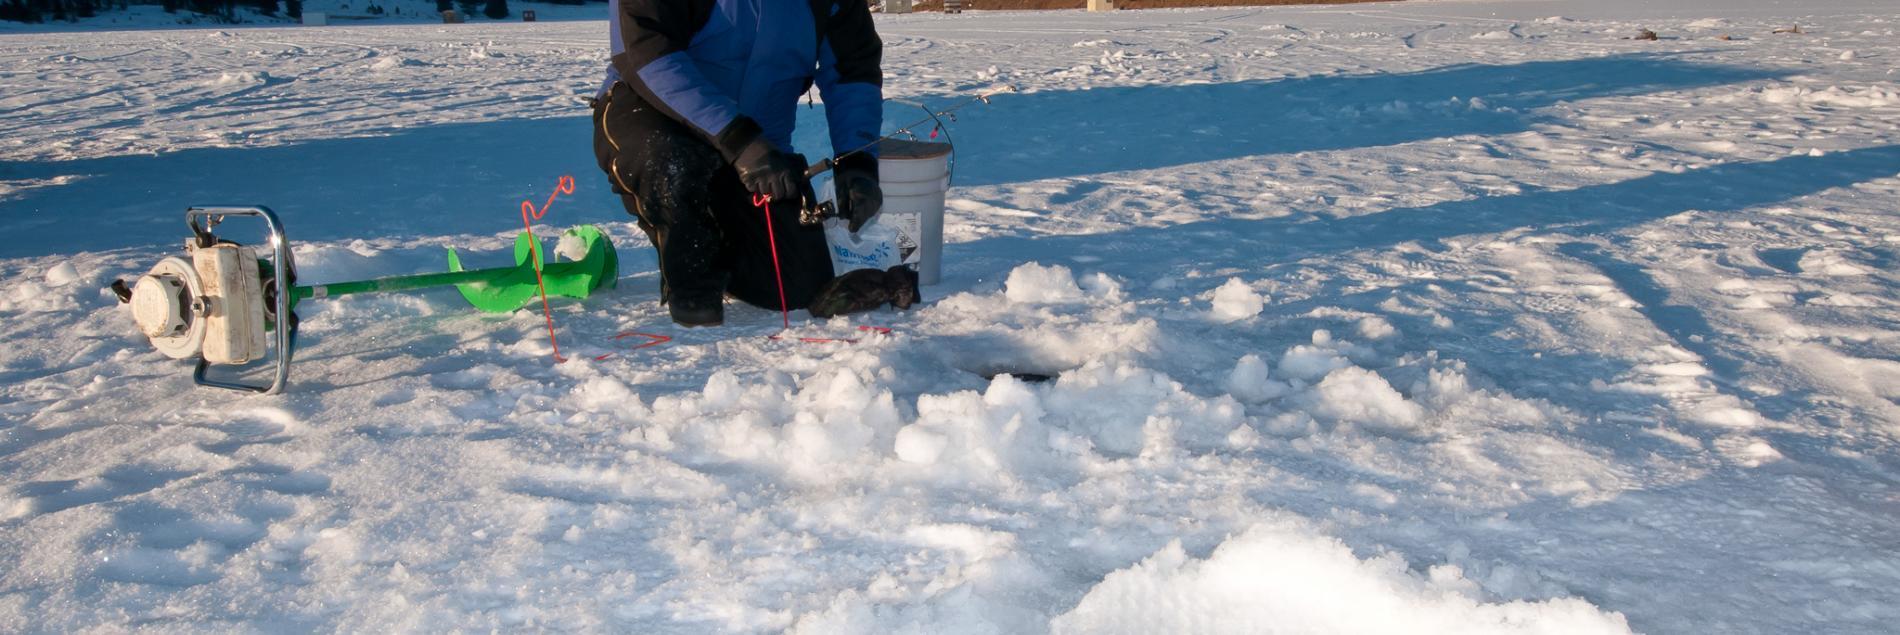 Fishing ice fishing black hills badlands south dakota for South dakota ice fishing guides